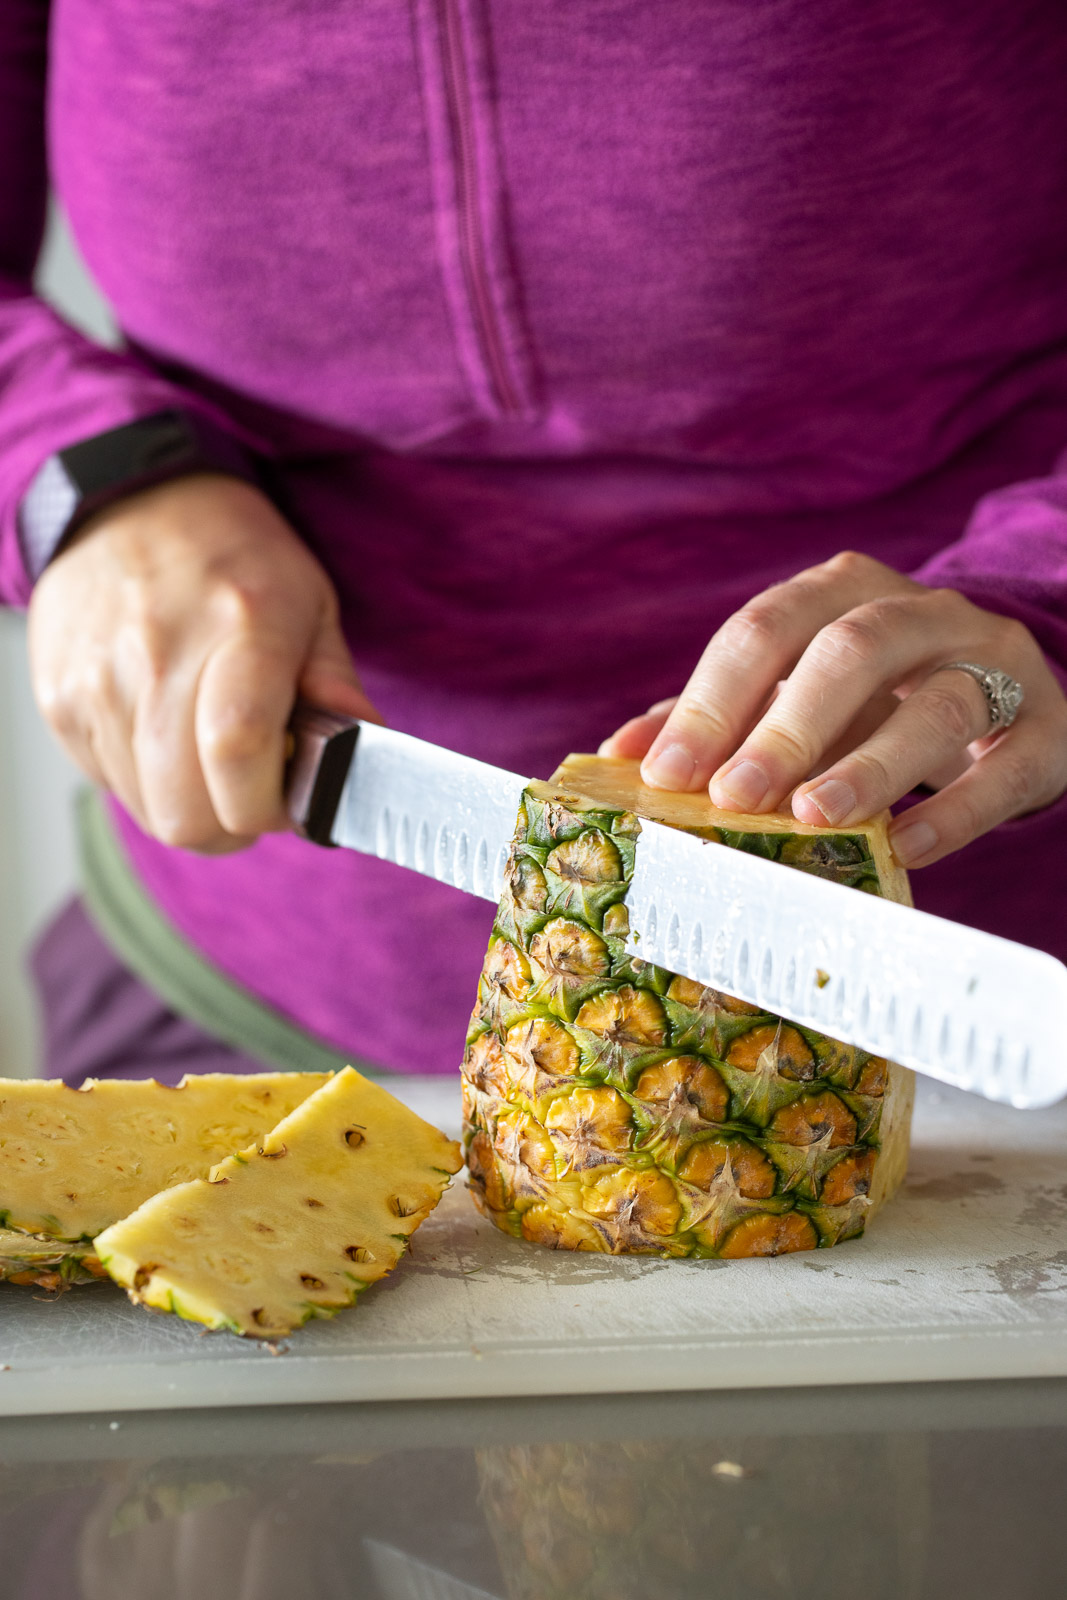 woman cutting up fresh pineapple on a plastic cutting board.